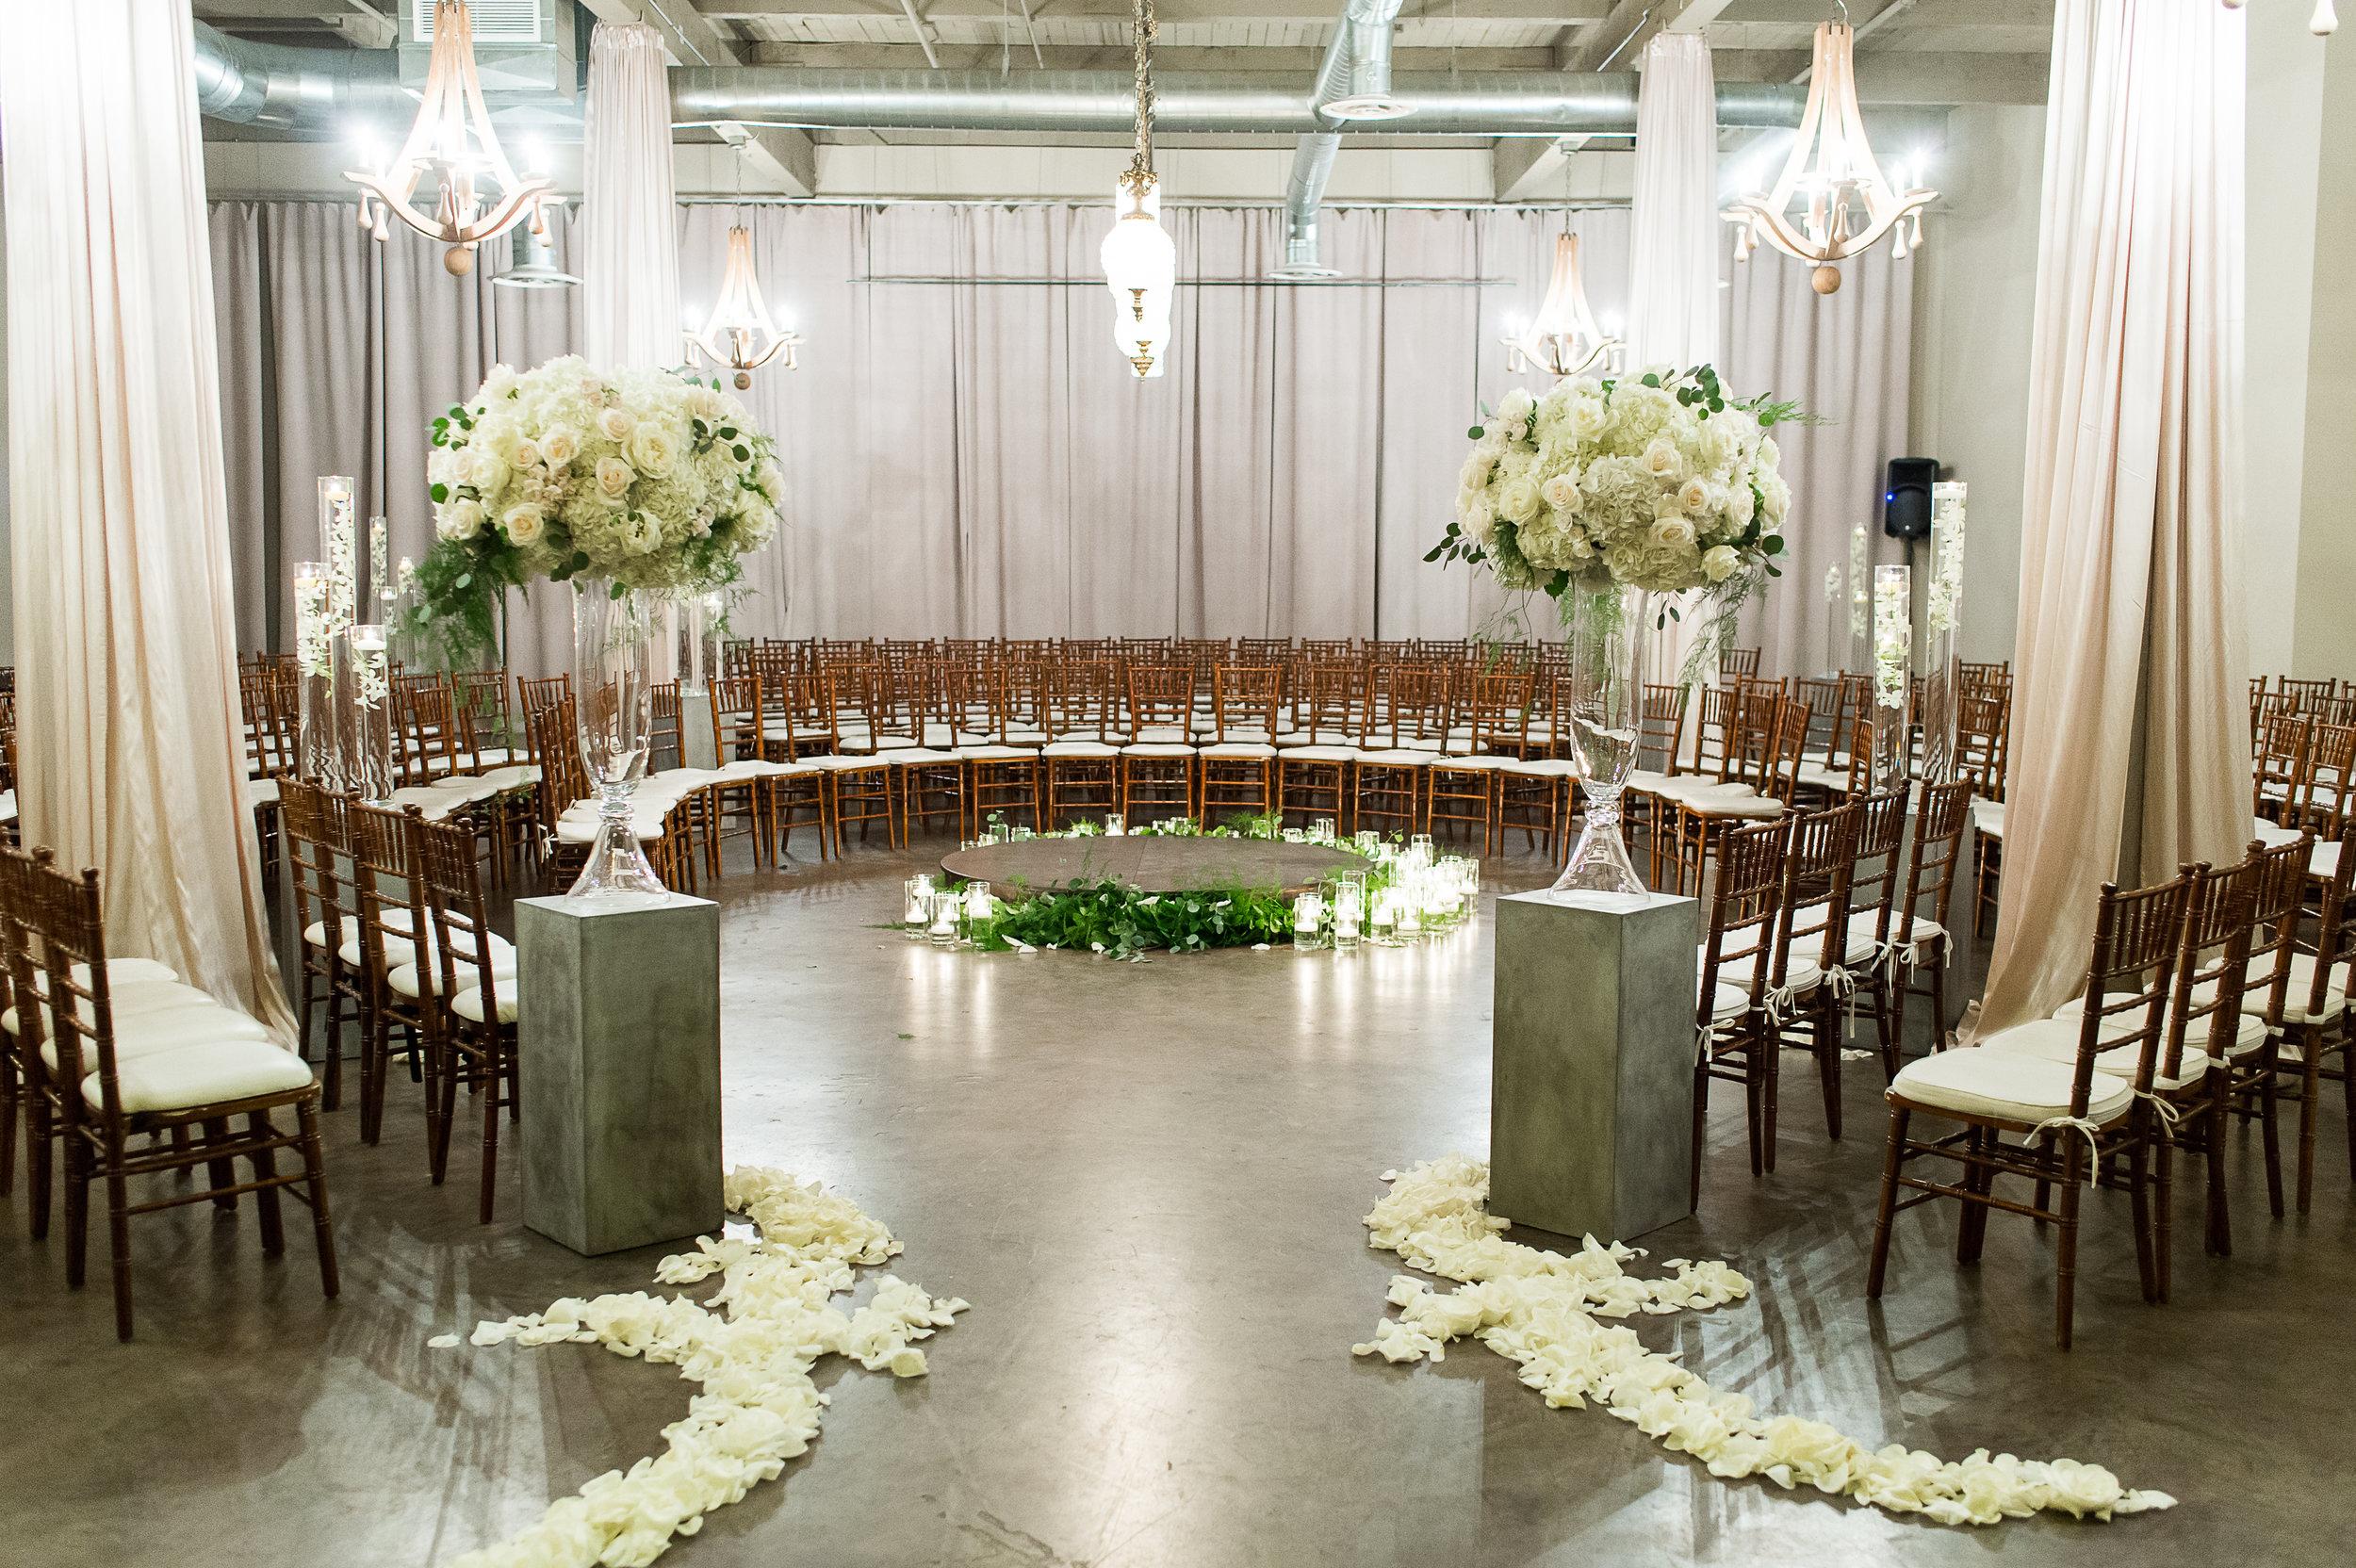 JJ-wedding-Van-Wyhe-Photography-300.jpg